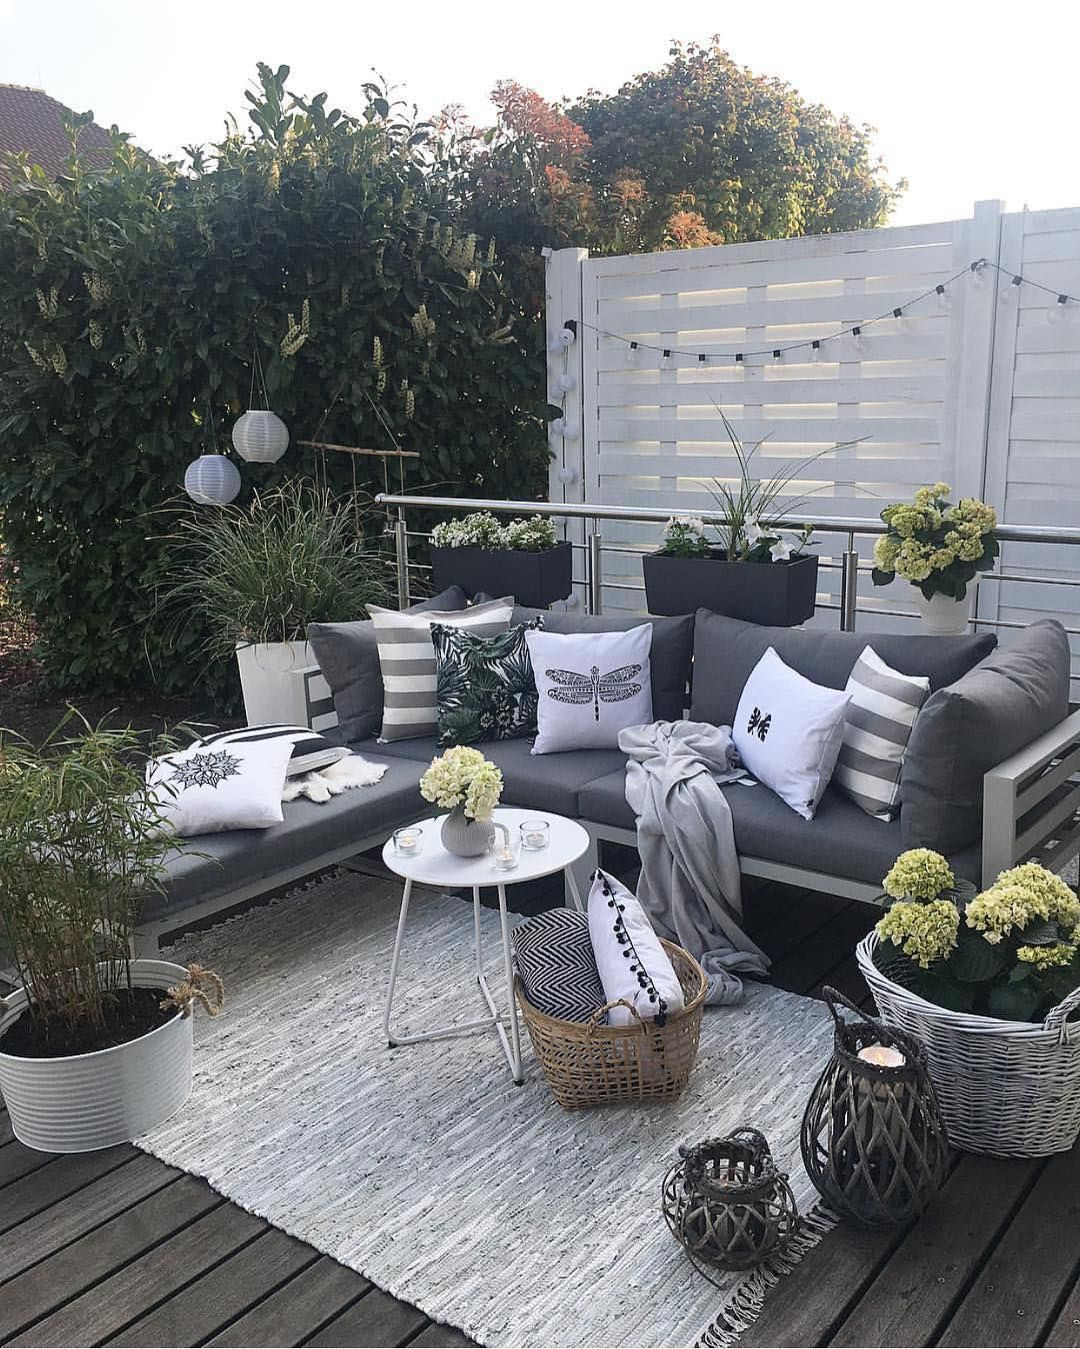 Cuscini Re Garden.Vibeke J Dyremyhr On Instagram Nice Outdoor Area Cred